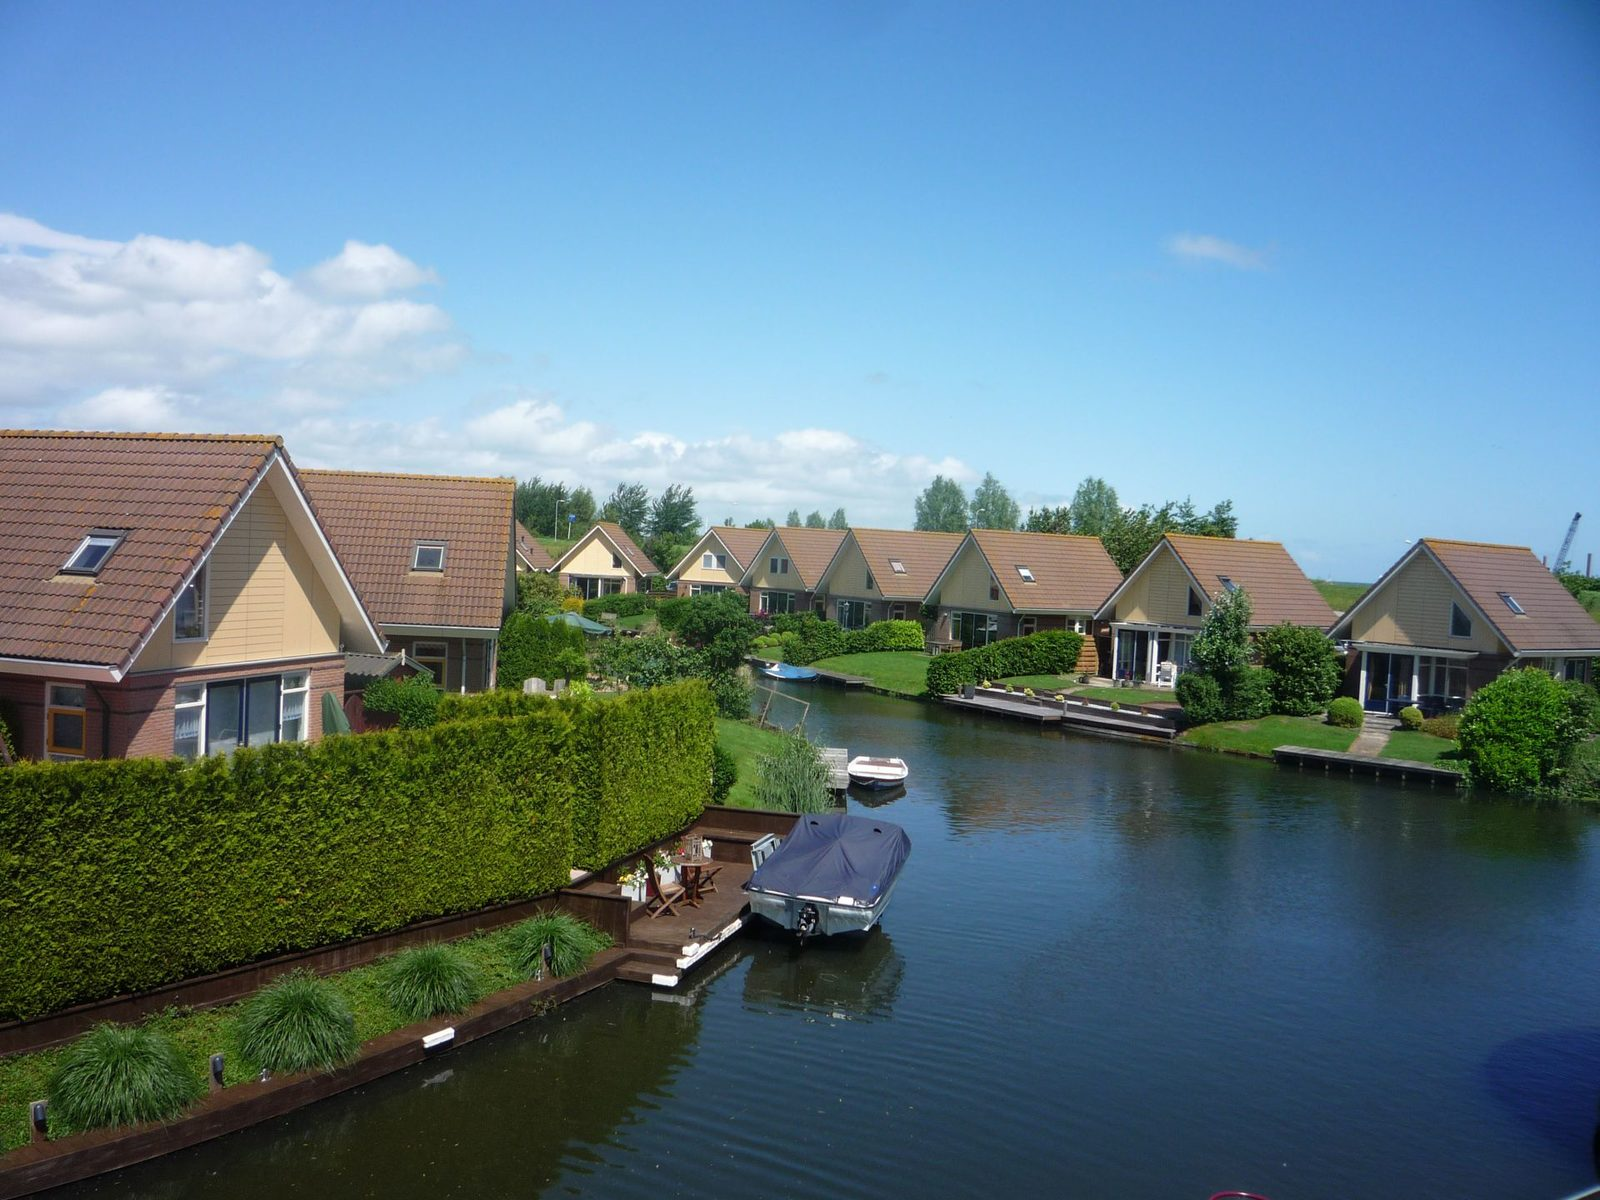 Luxurious bungalows